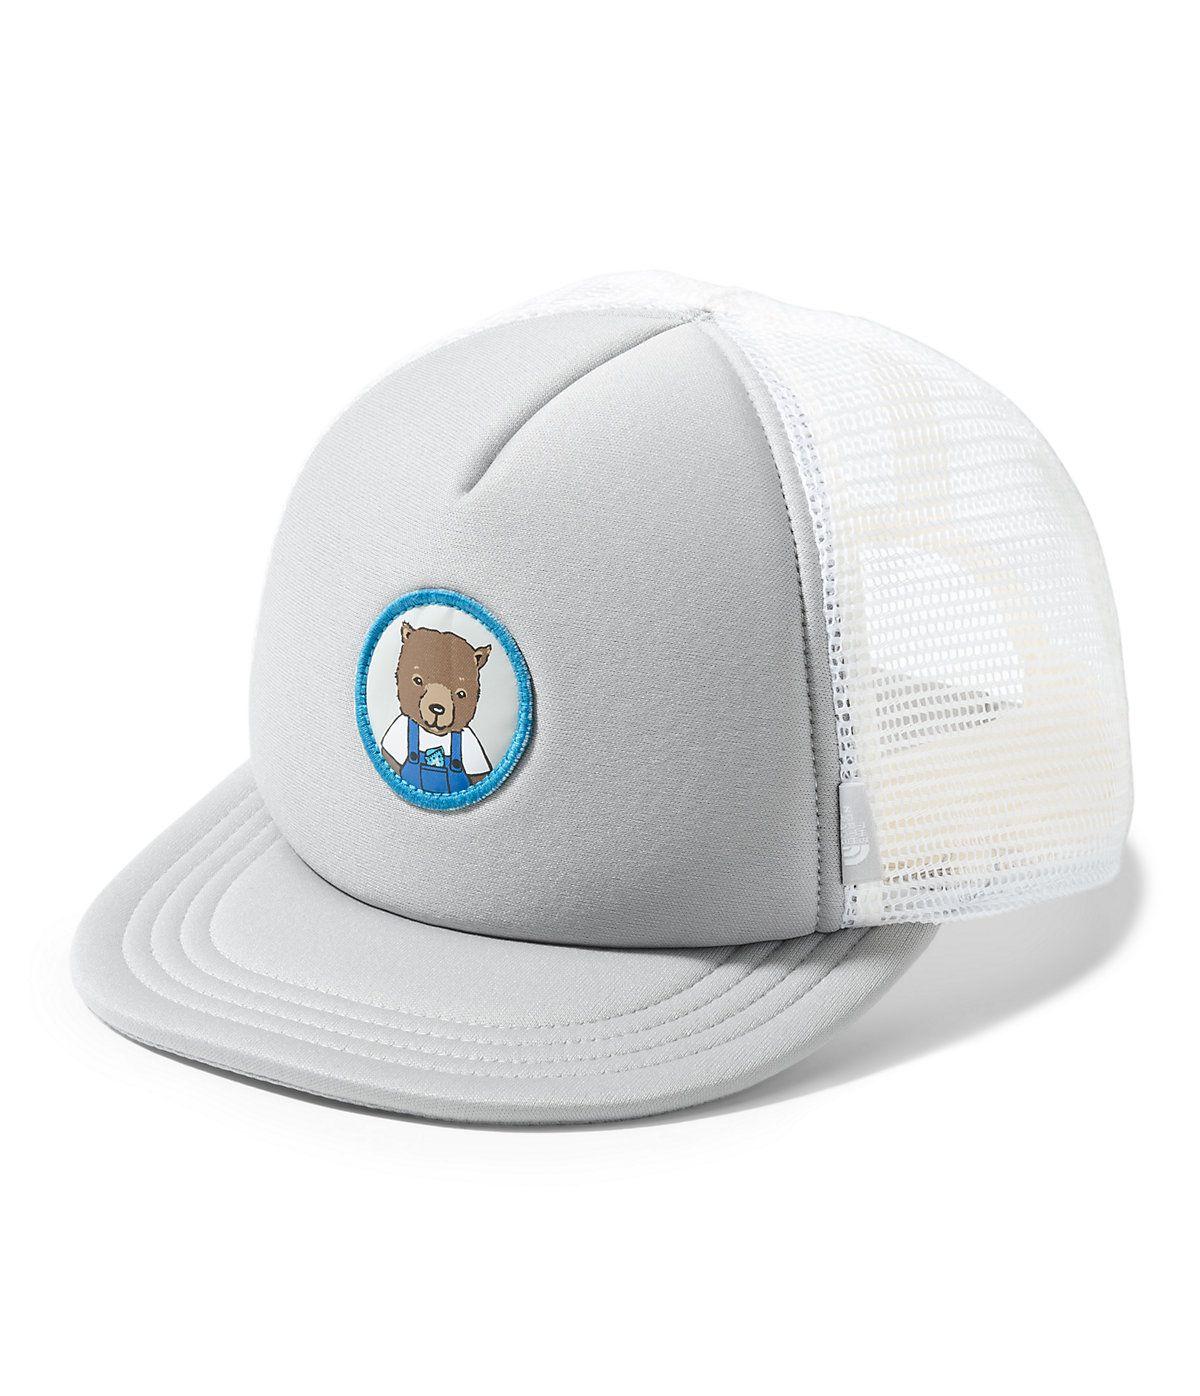 abf2fc066 Mini trucker hat in 2019 | Products | Hats, Baseball hats, Riding ...